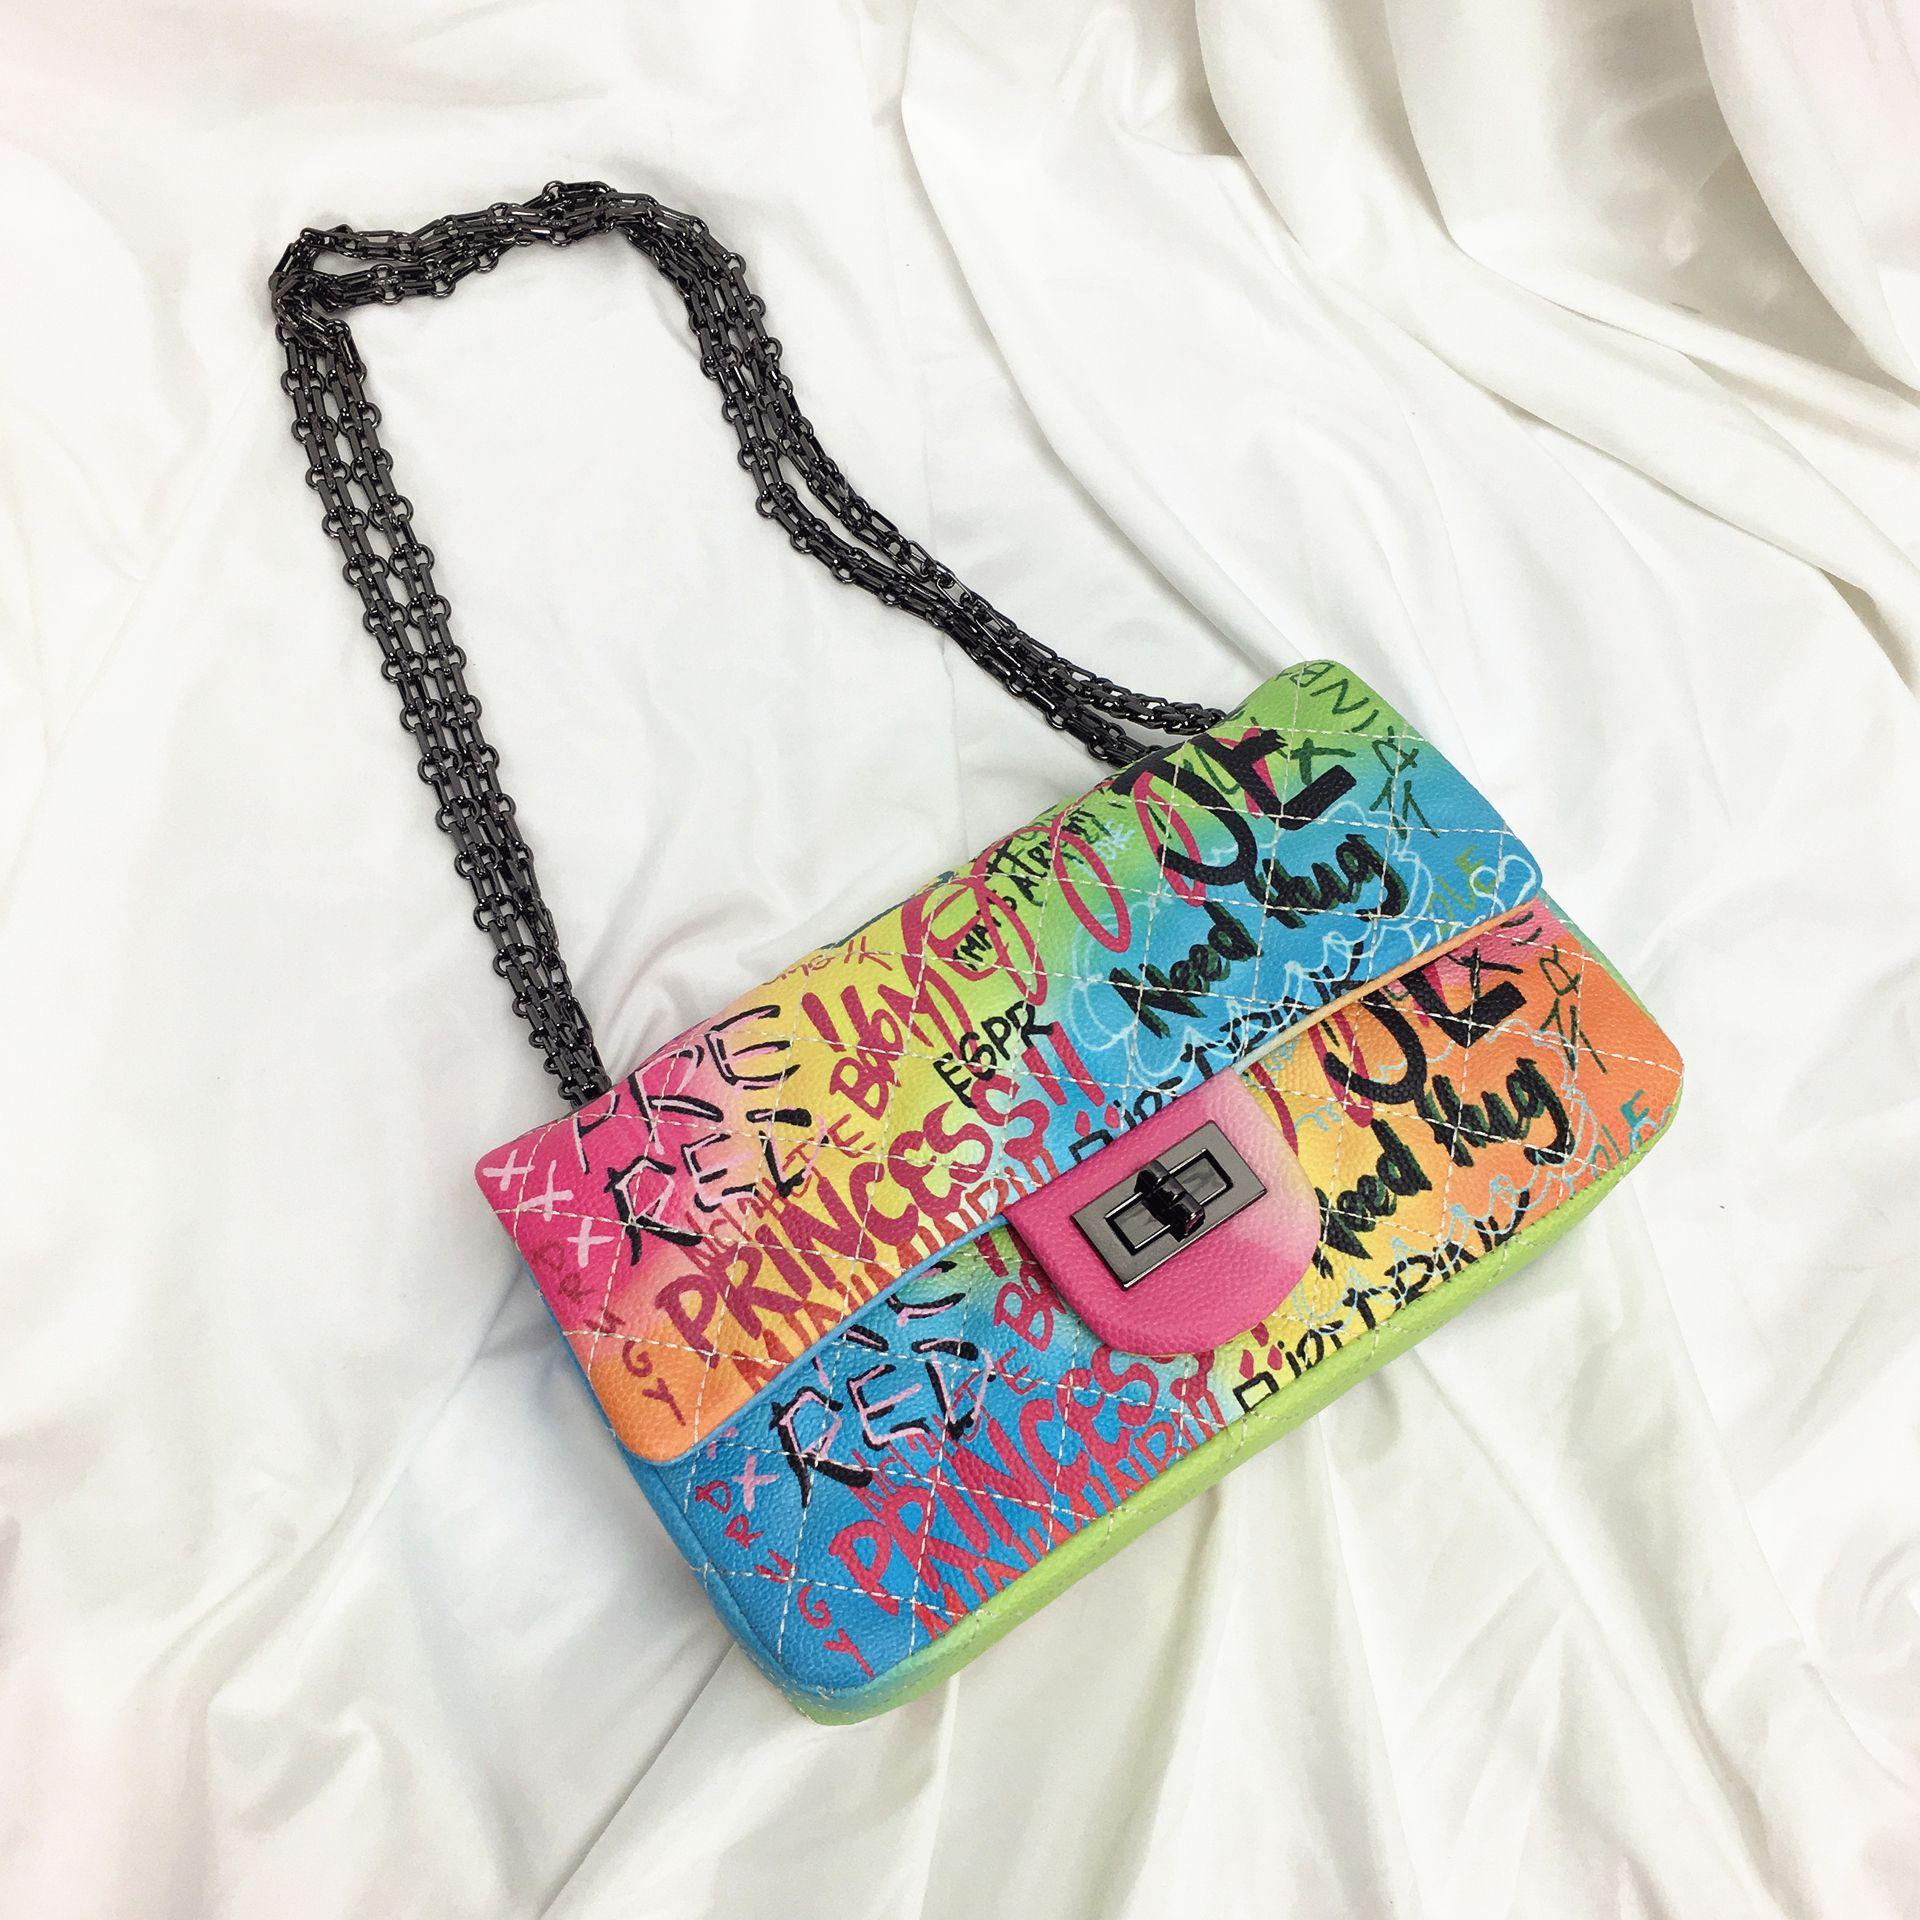 2019 grandes bolsas de luxo bolsas femininas